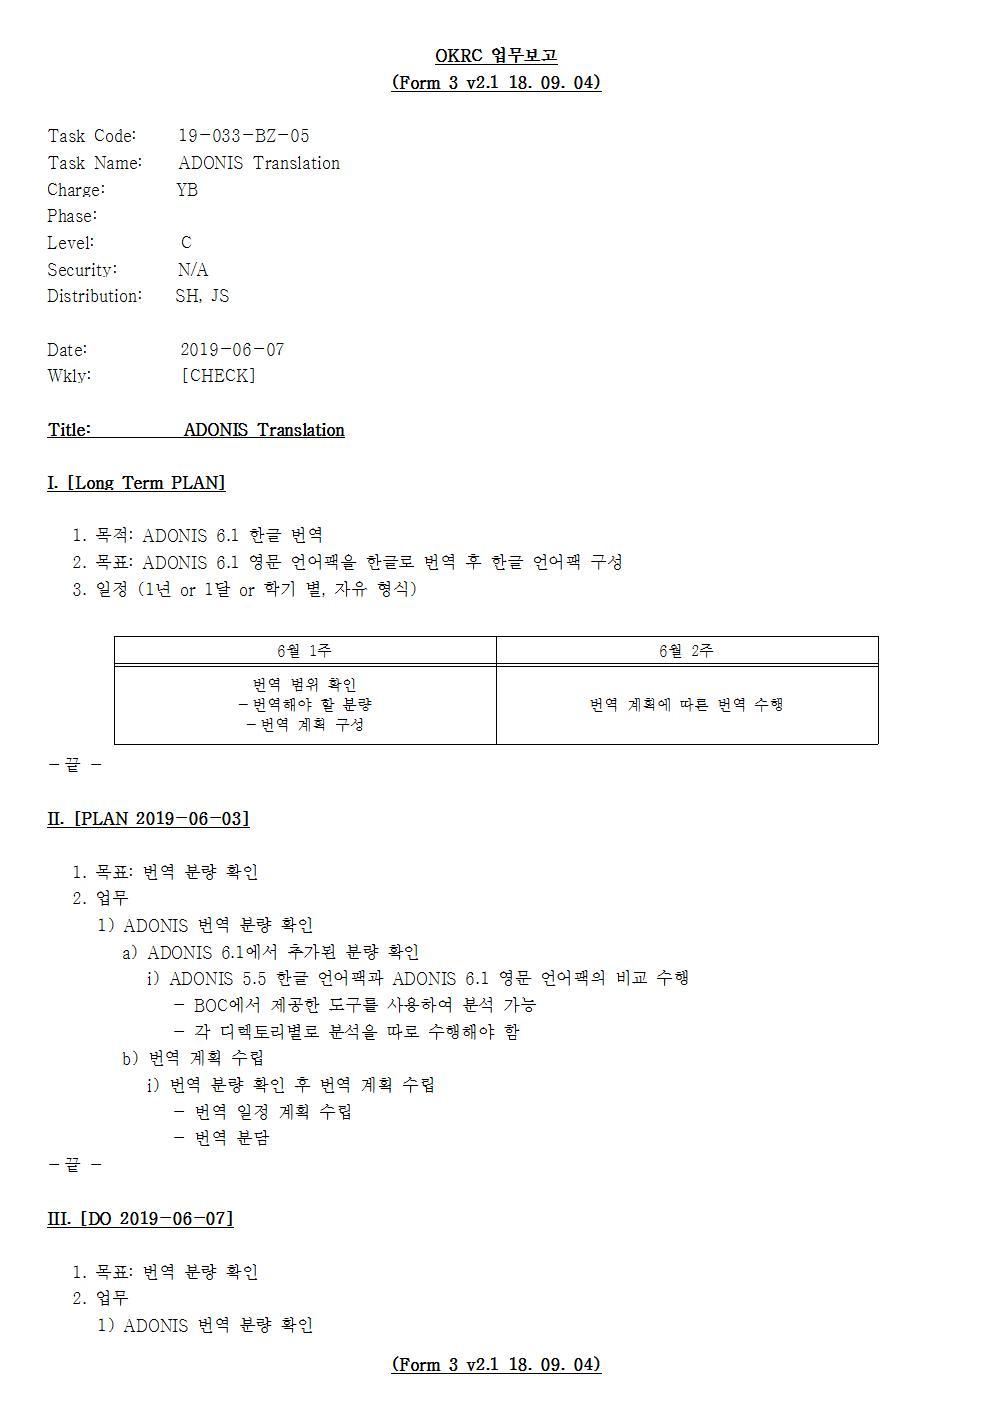 D-[19-033-BZ-05]-[ADONIS Translation]-[2019-06-07][YB]-[19-6-1]-[P+D+C]001.jpg